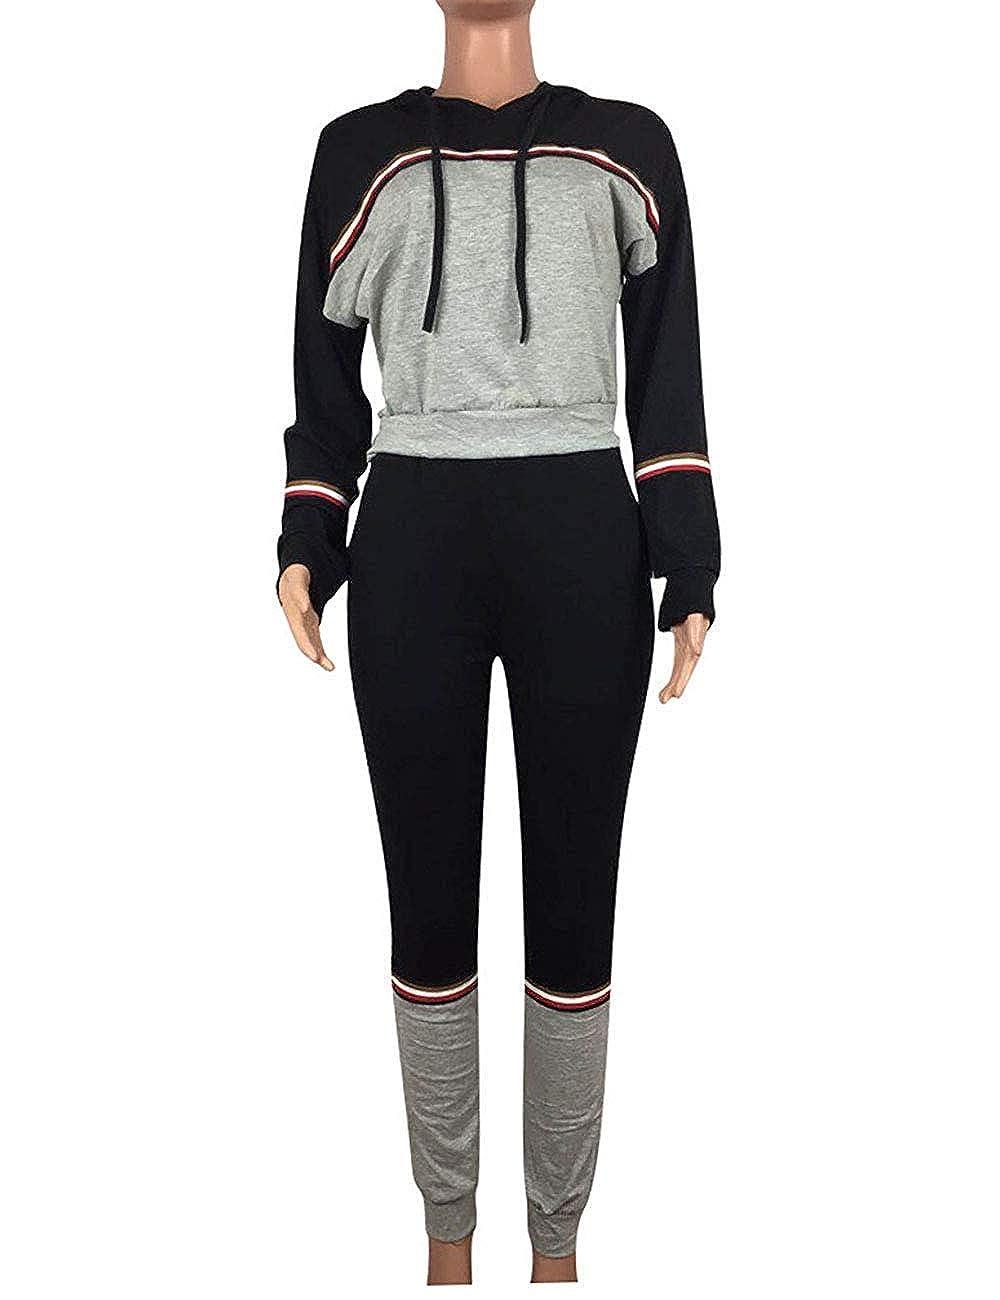 008e32a6eee 2Pcs Womens Hoodies Sport Tops Pants Tracksuit Sweatshirt Sweat Suit  Jogging Set at Amazon Women's Clothing store: